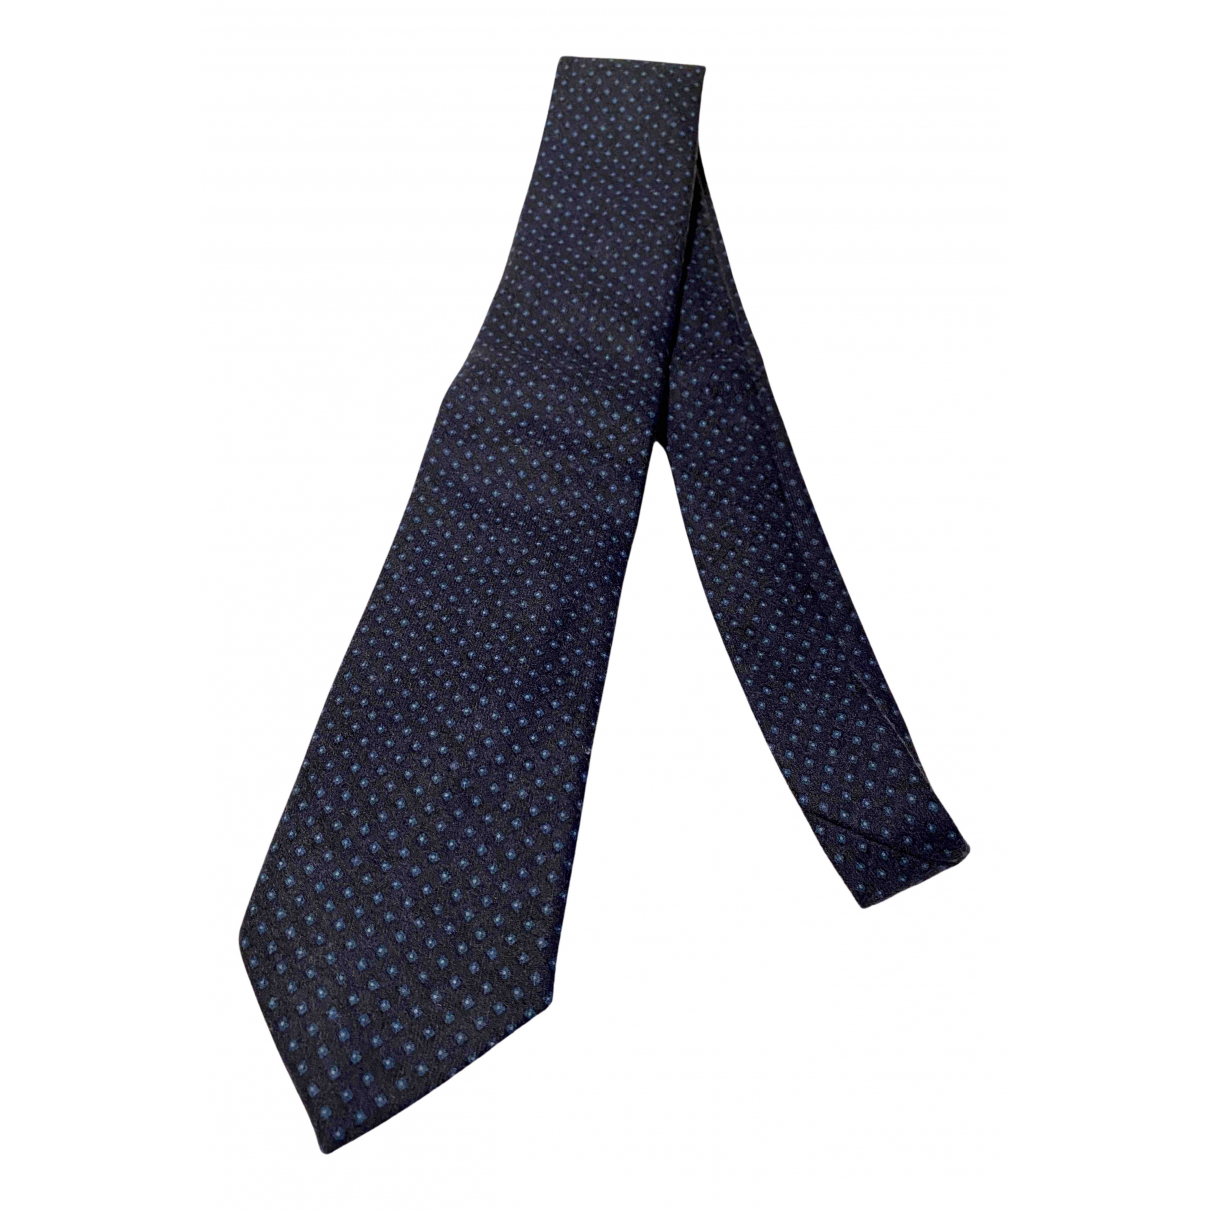 Boggi \N Krawatten in  Blau Wolle